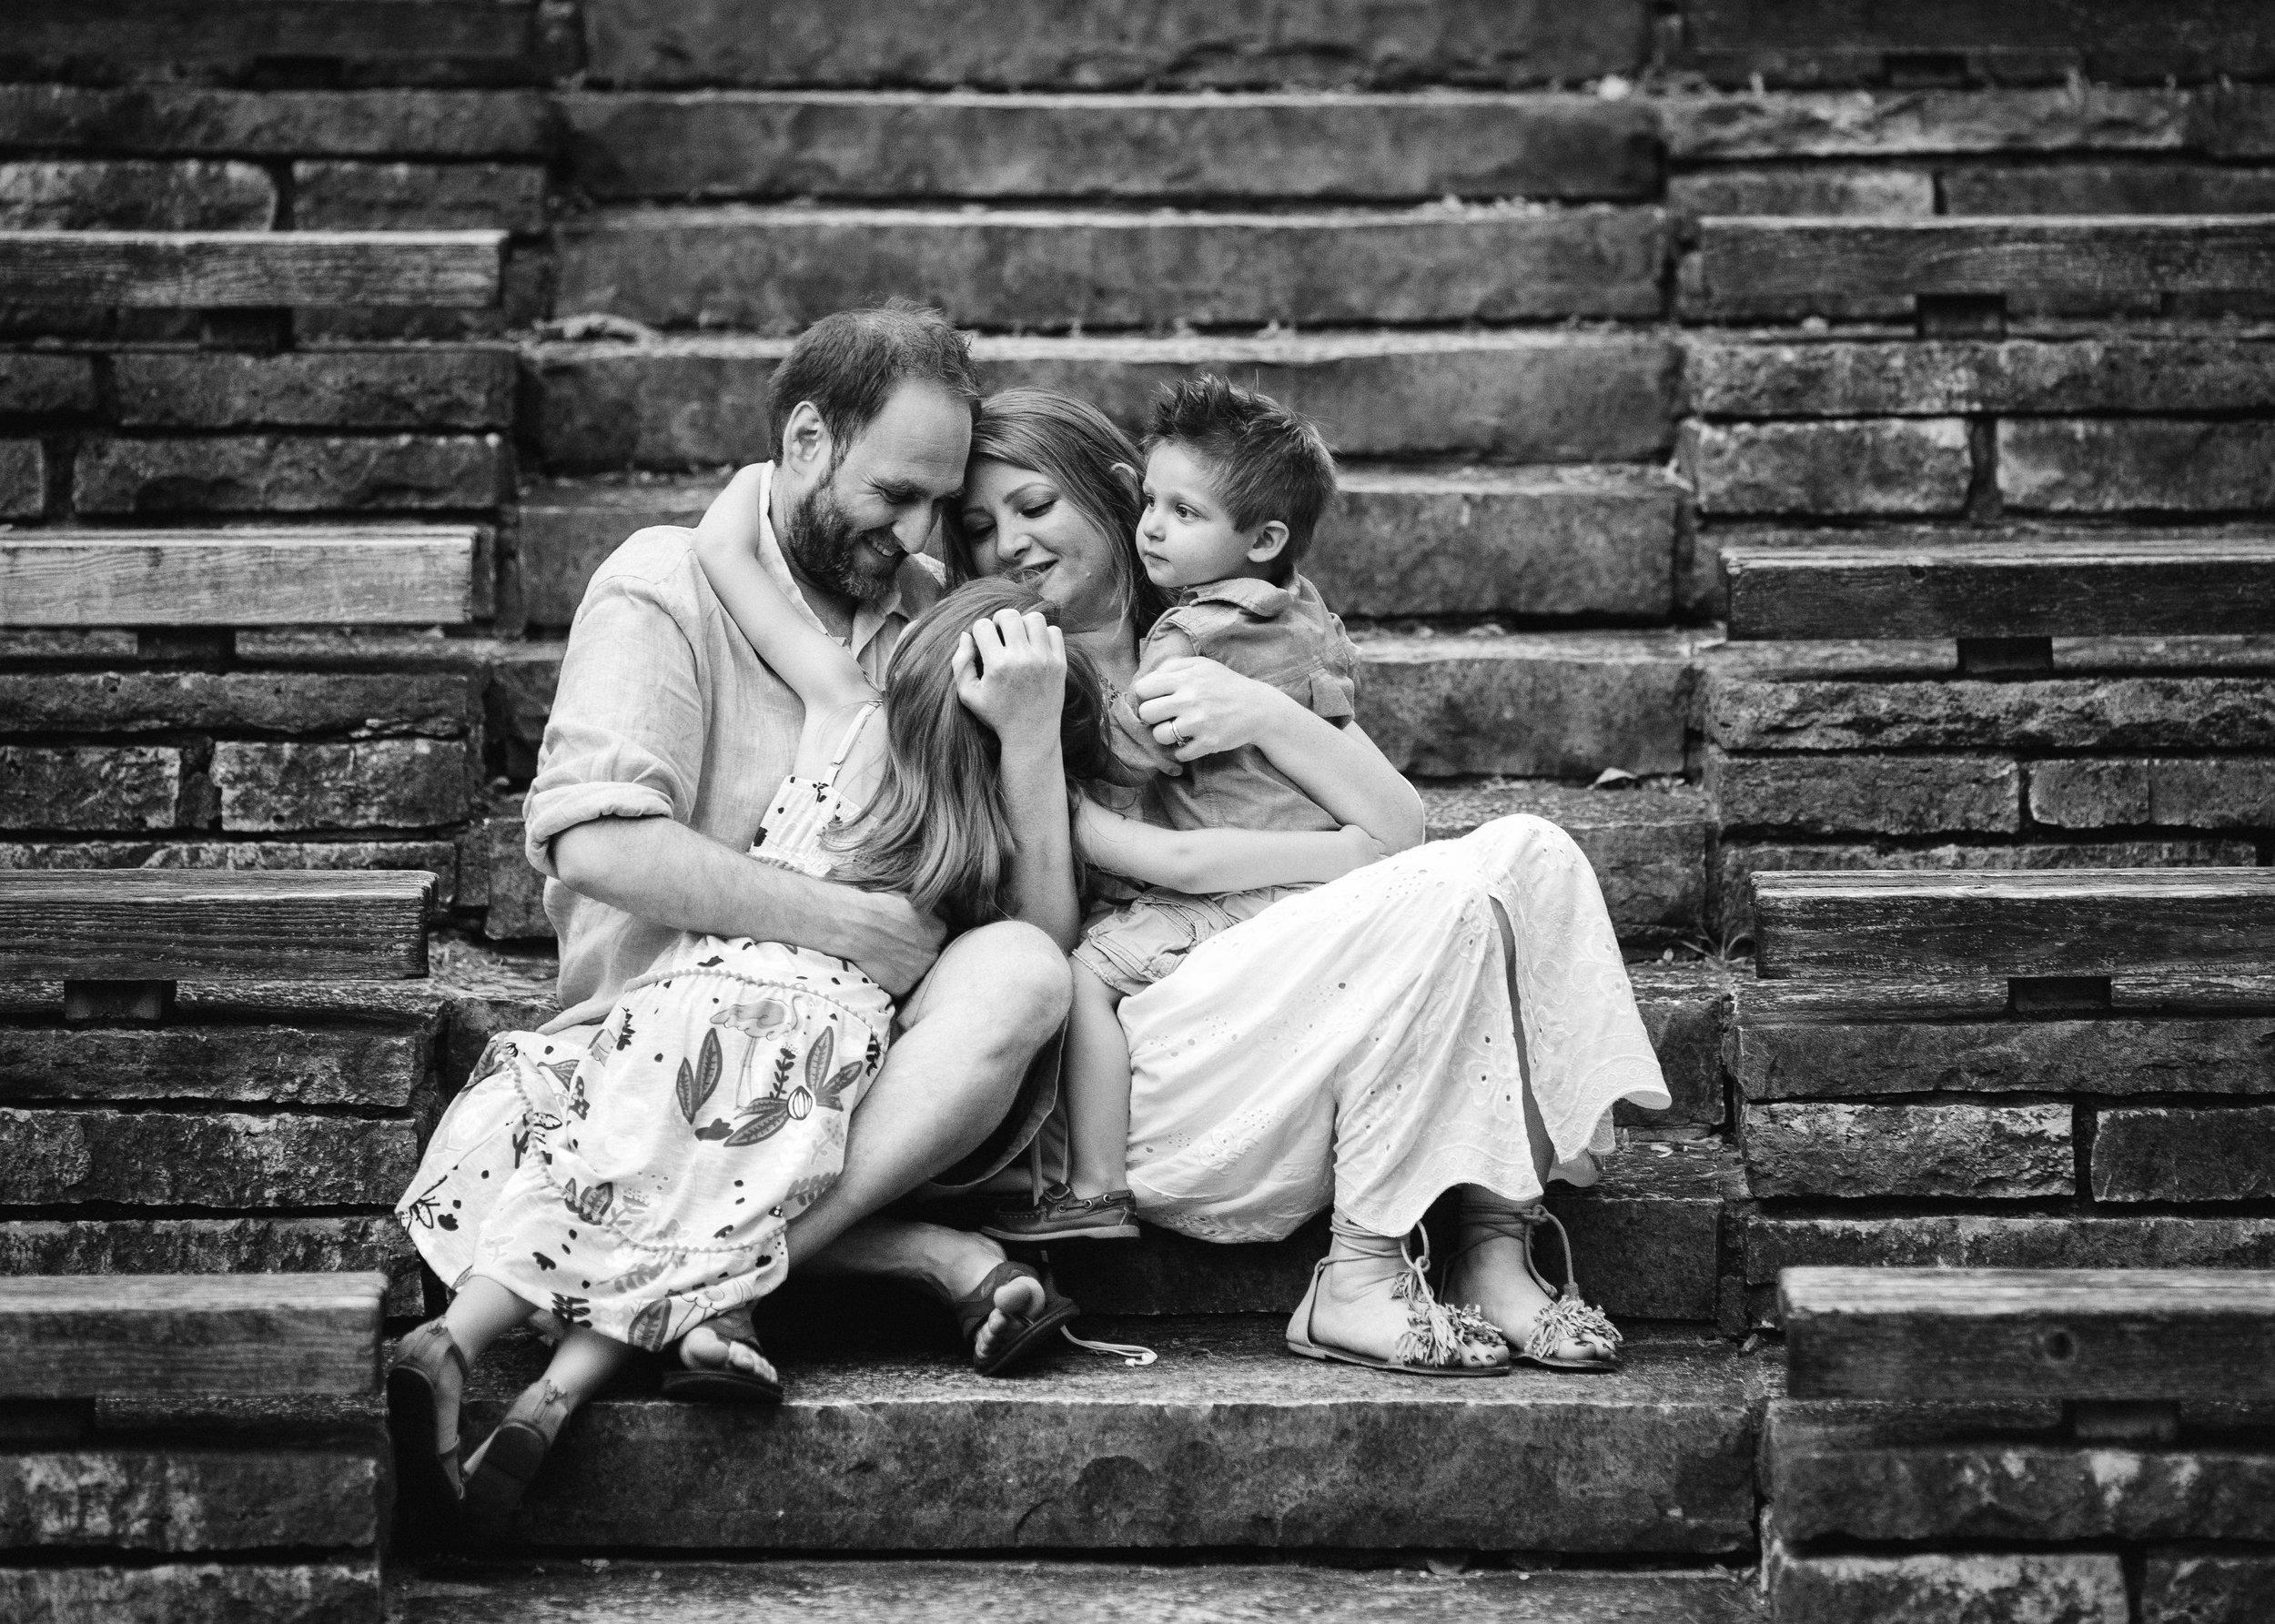 NicolaLevine_NorthShore Portrait Photographer_Chicago family photographer_ Chilren's photographer, North Shore photographer, Deerfield Family photographer, Deerfield lifestyle photographerLG9A9525-Edit-2.jpg